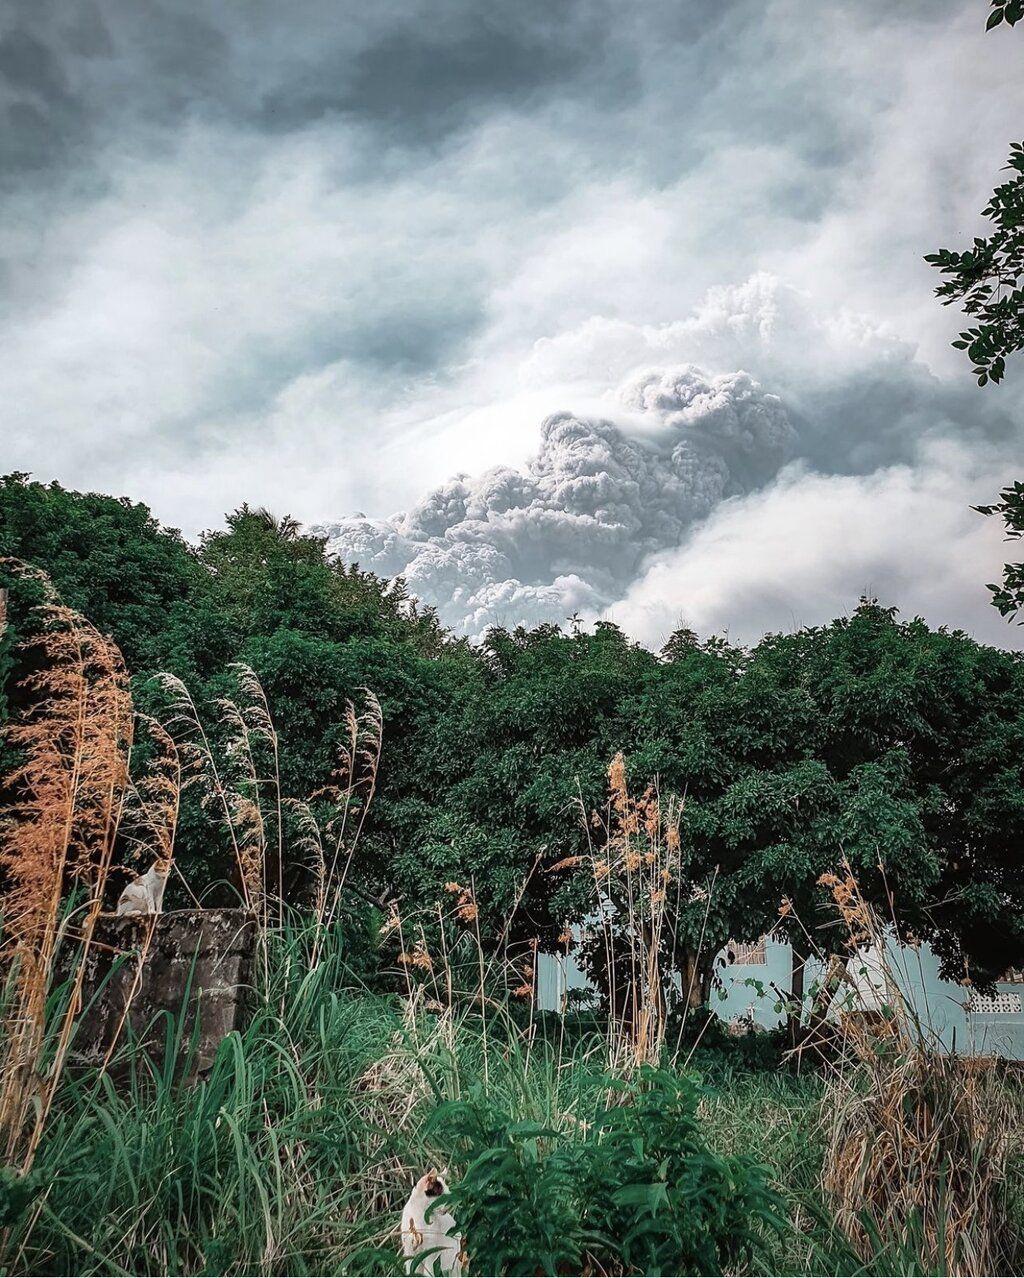 Dense ash column generated by Soufrière St. Vincent volcano yesterday (image: @StvincentGren/twitter)